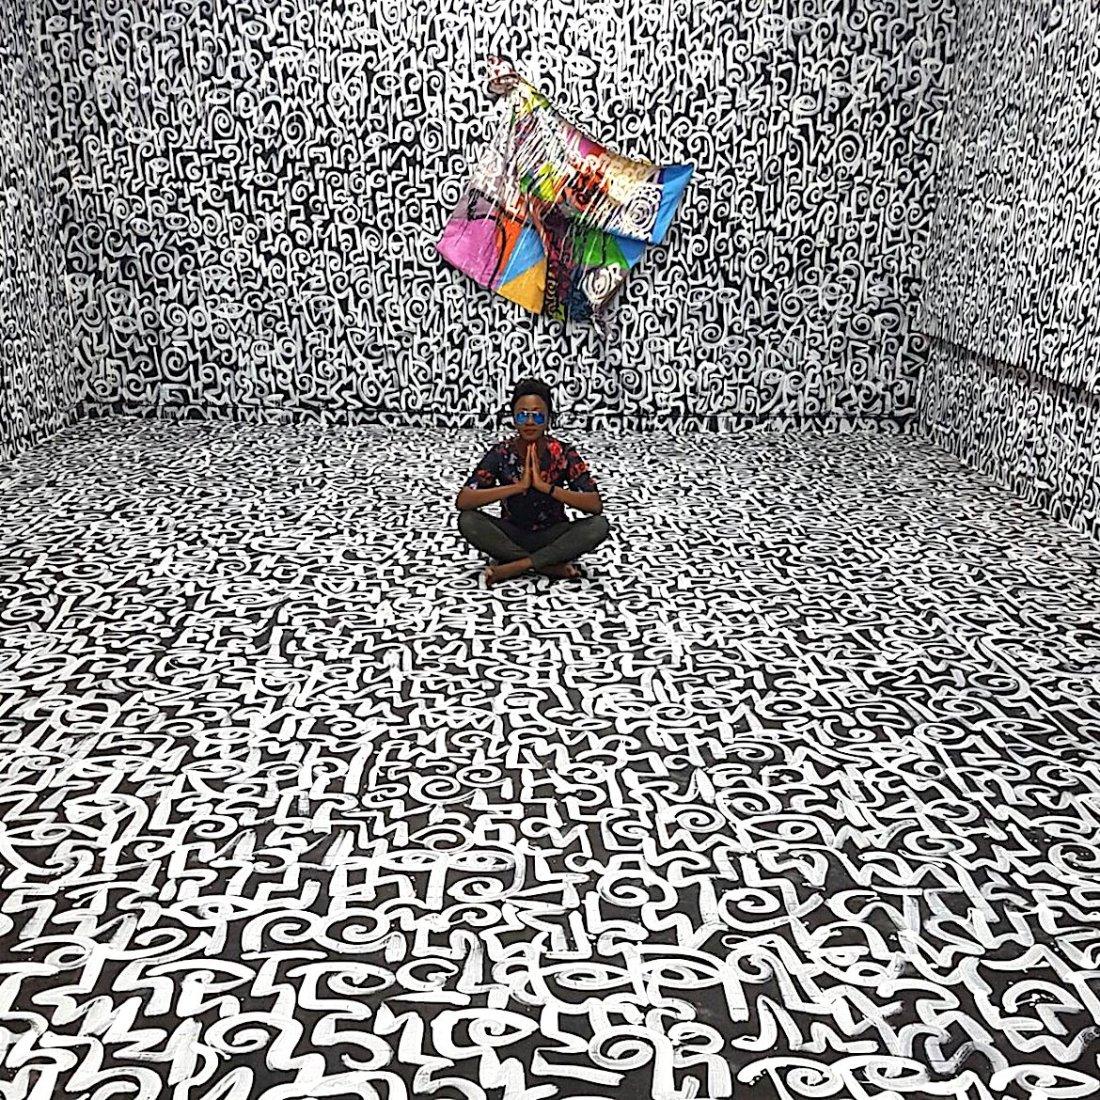 ART X Lagos, African Art, African Art Fair, Victor Ehikhamenor, KOLUMN Magazine, KOLUMN